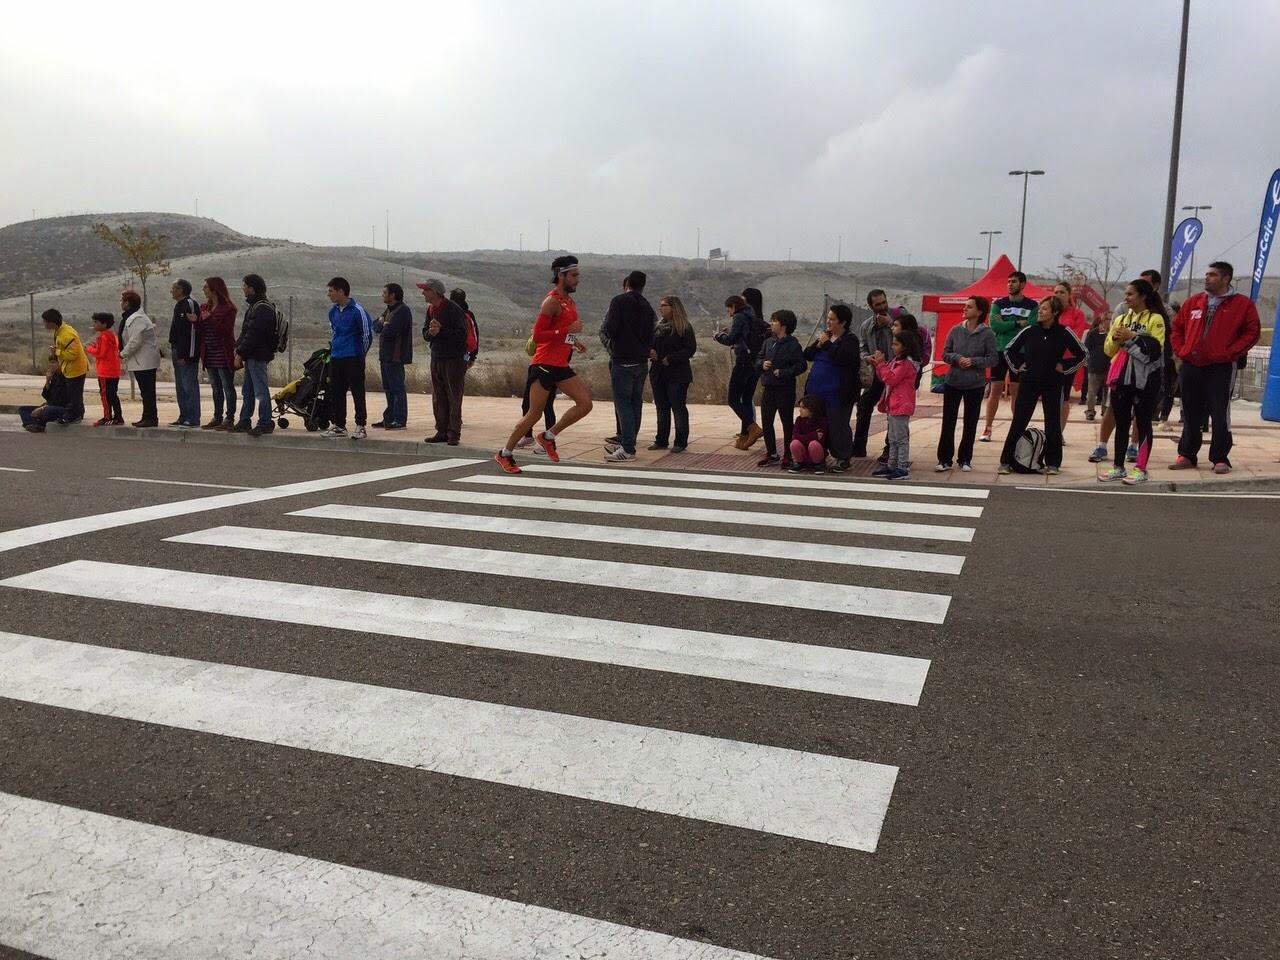 10km desafio arcosur zaragoza carrera pitufollow